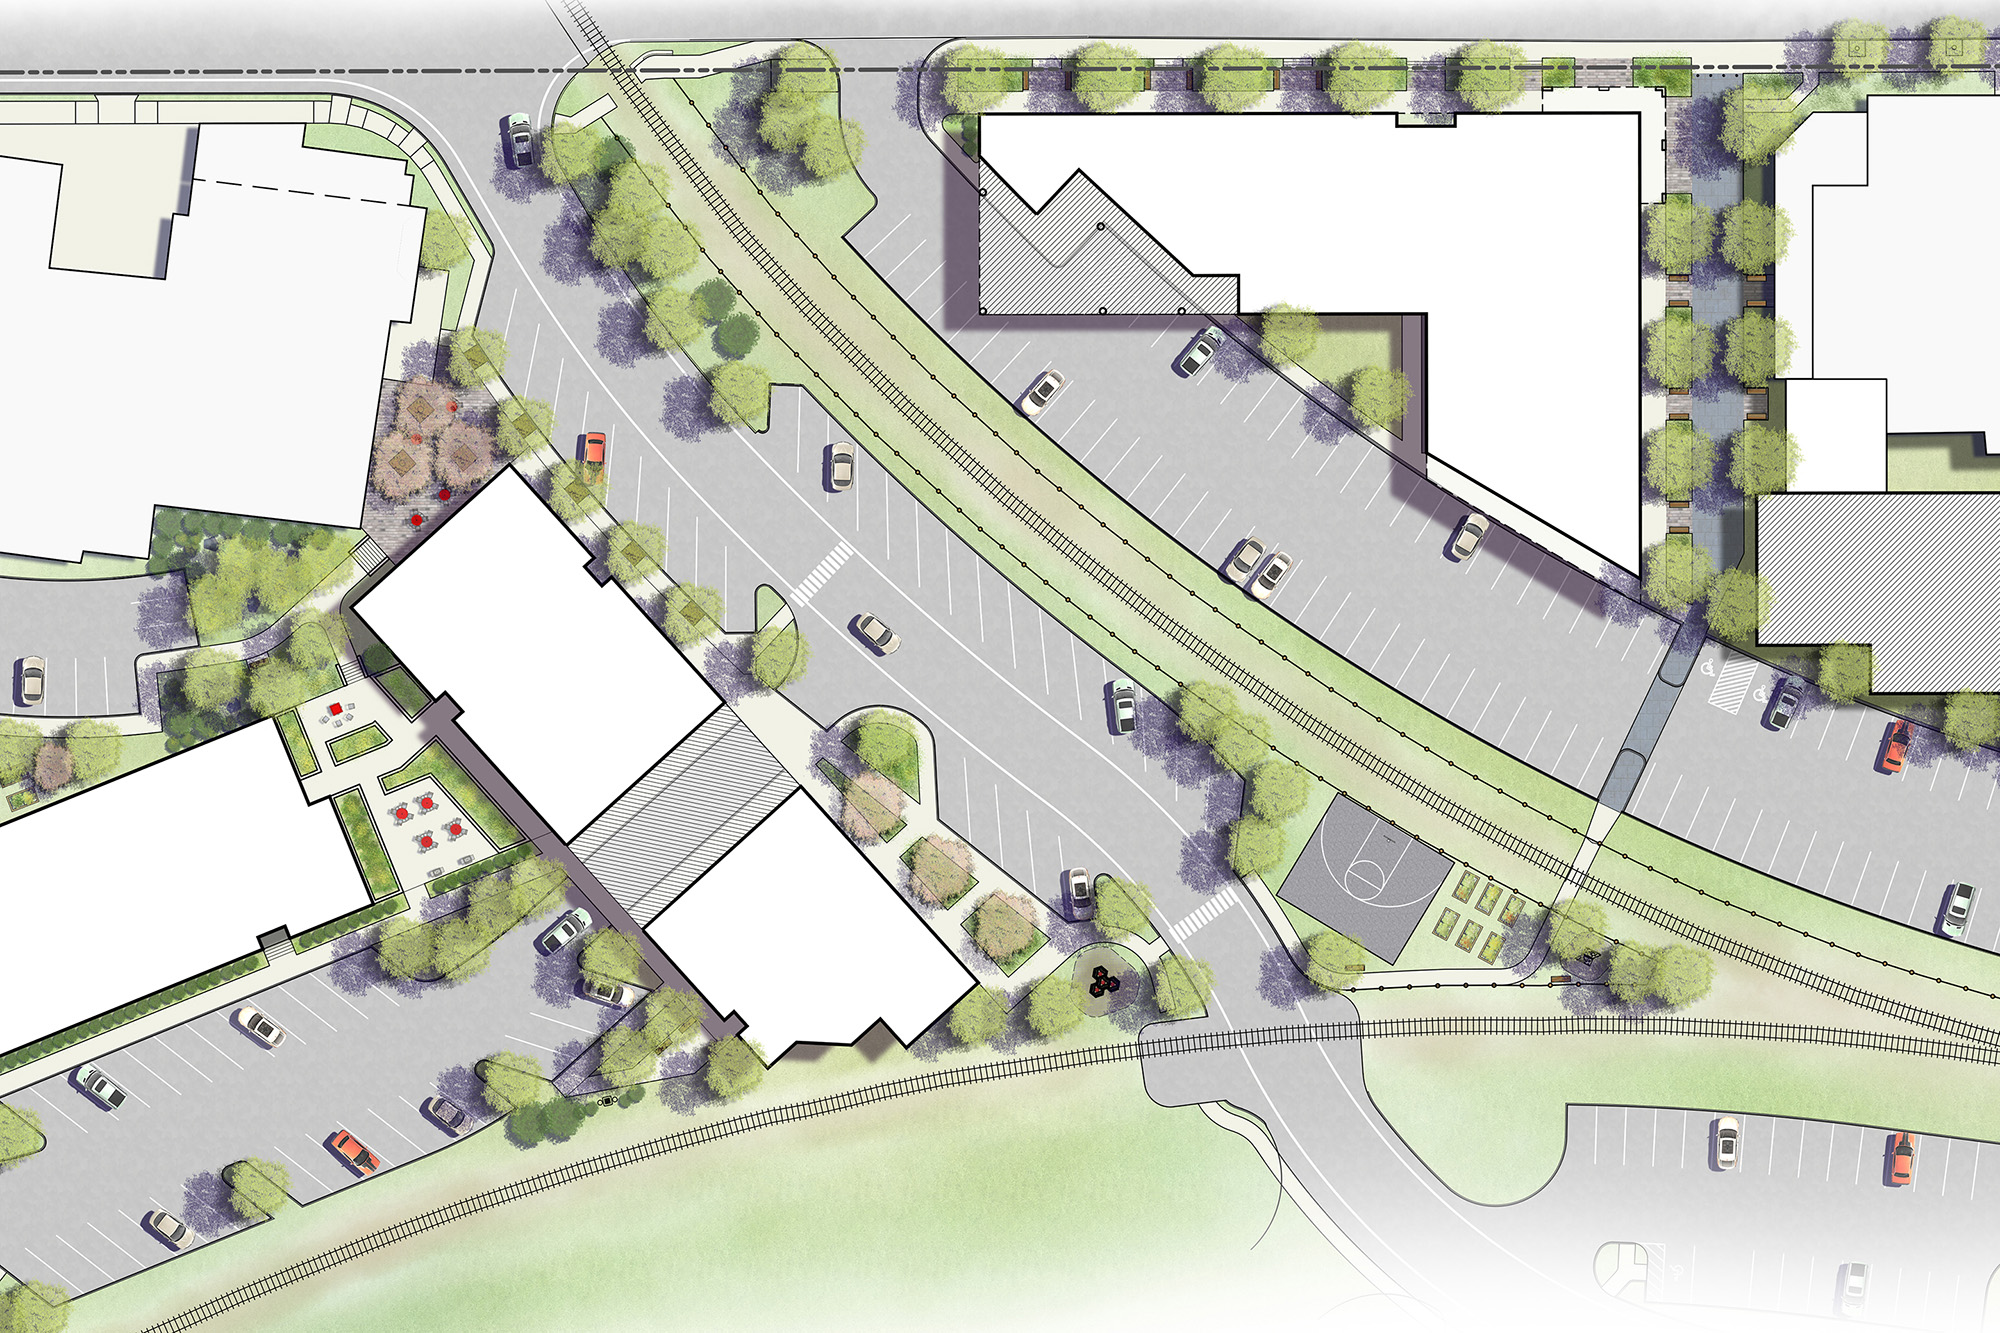 2017-07-10-Essex_Conceptual_Plan.jpg